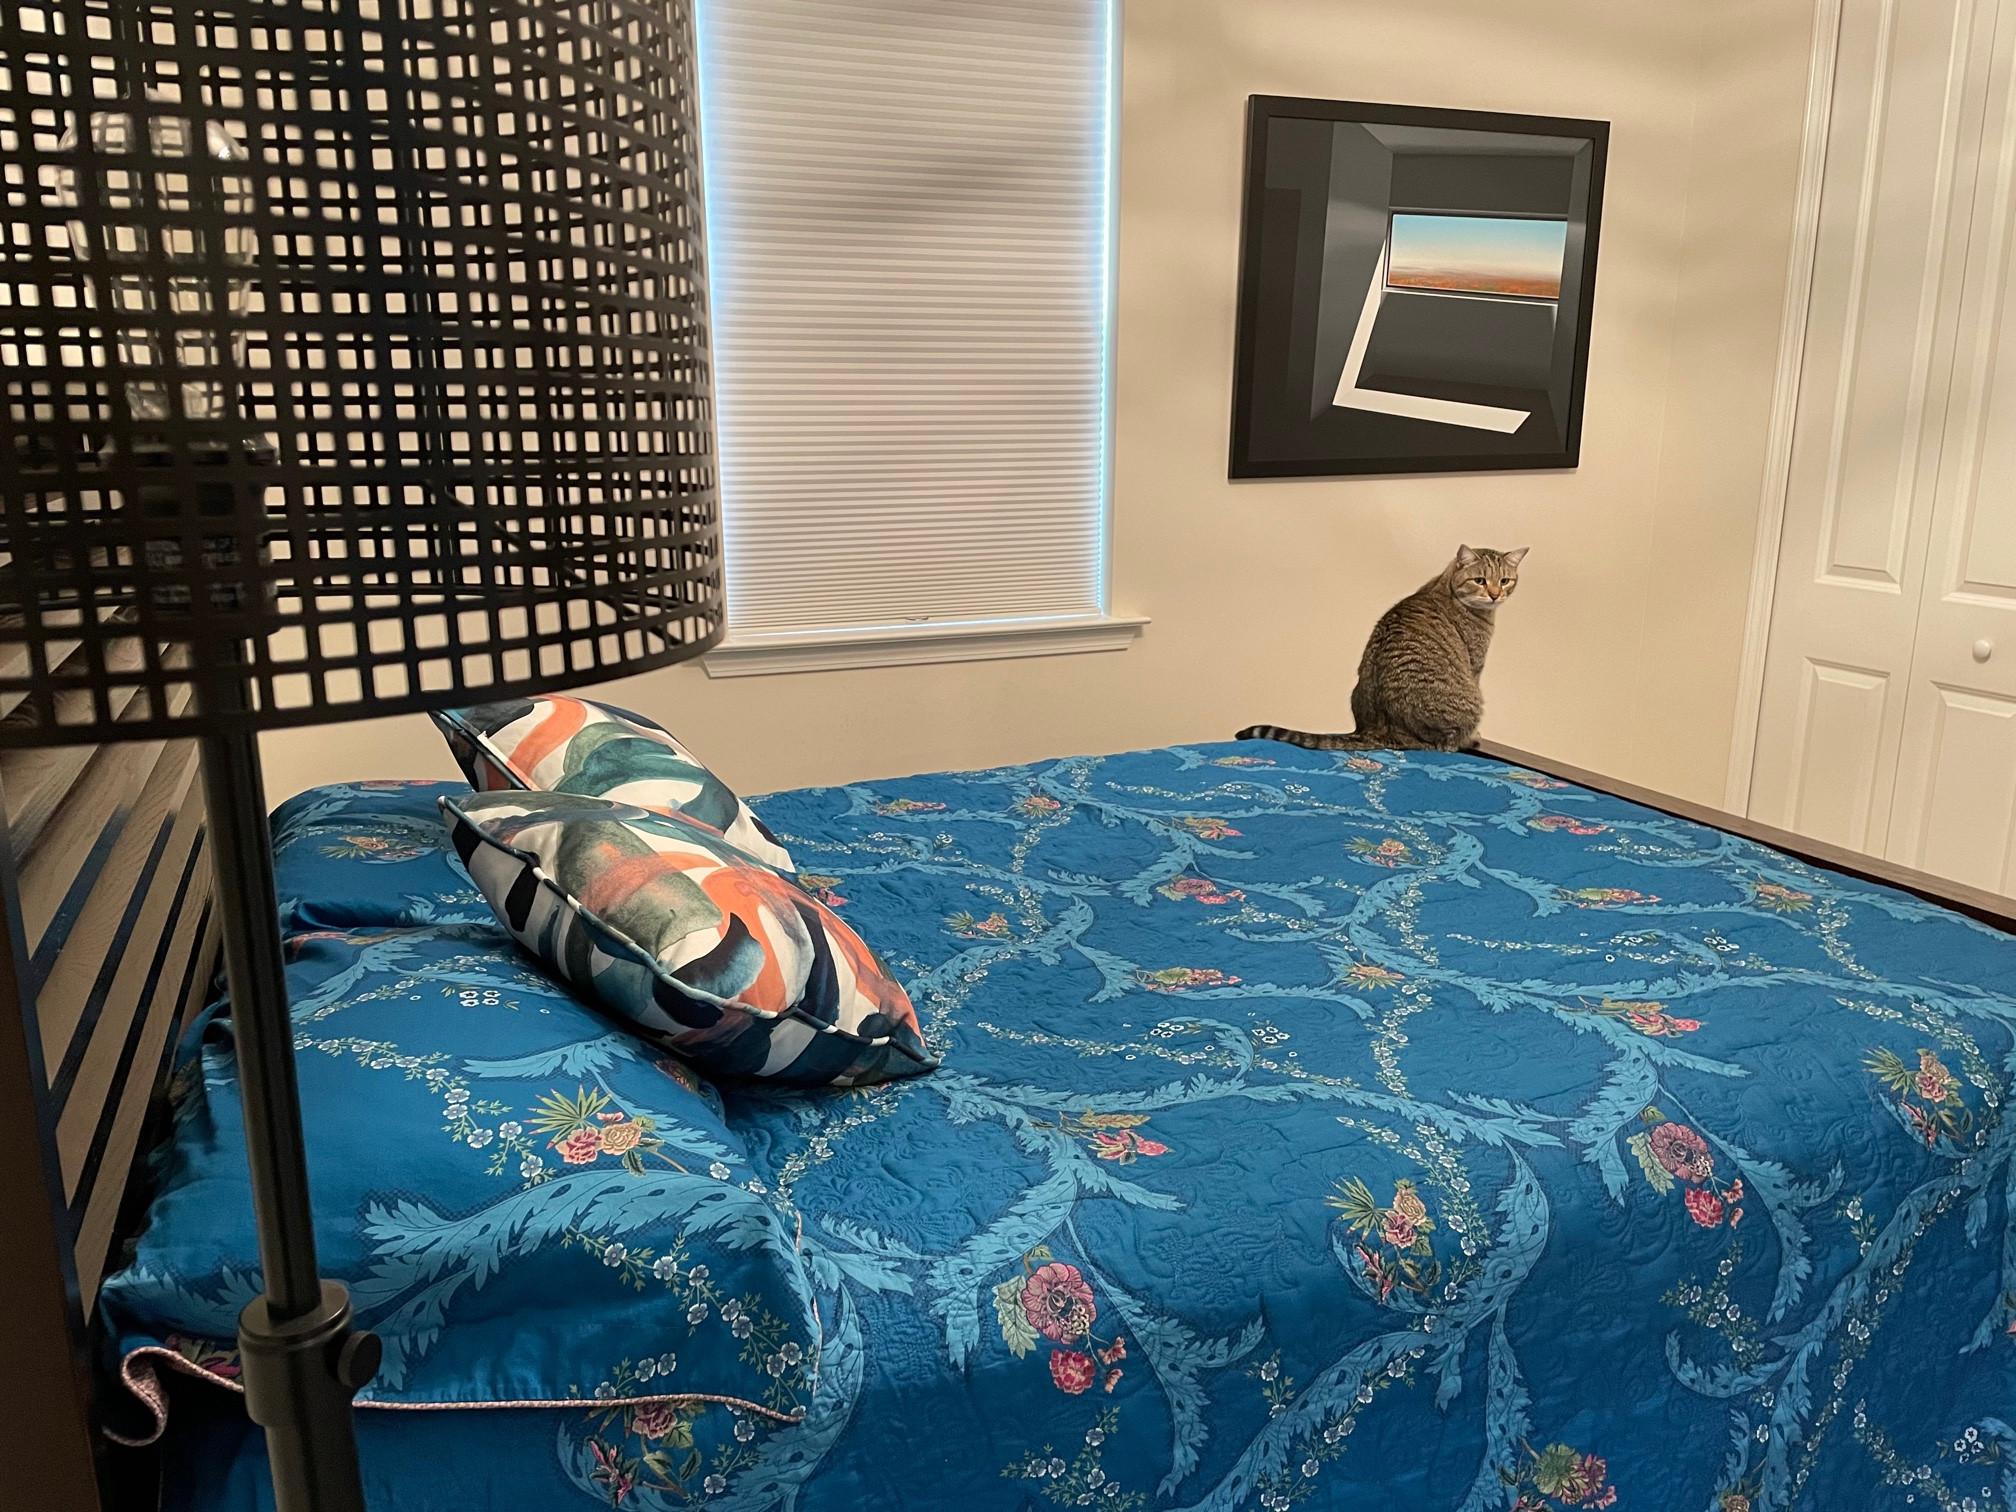 Margarittaville Design Guest Bedroom